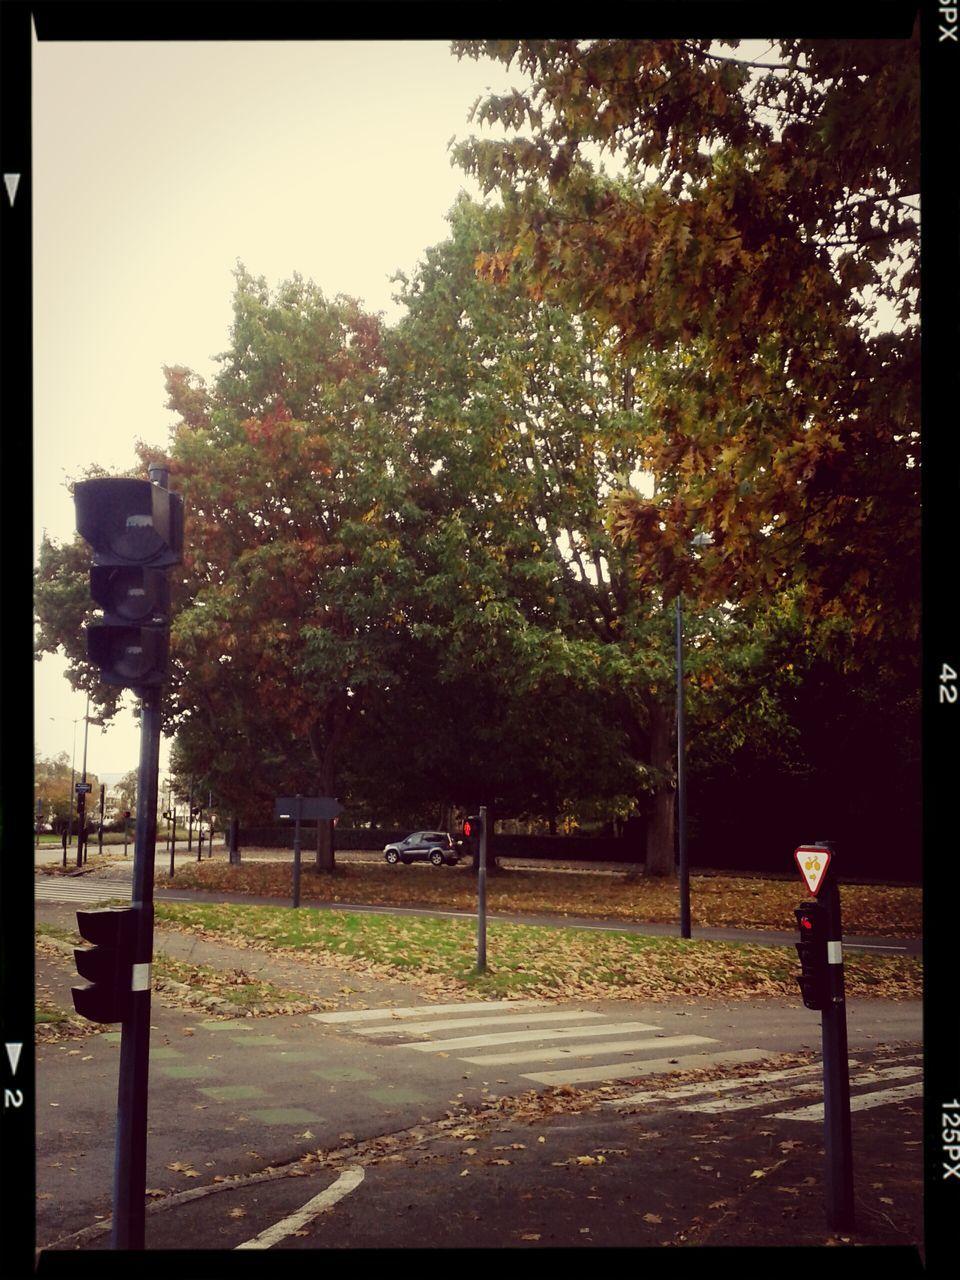 tree, road, road sign, street light, street, outdoors, transportation, no people, day, stoplight, sky, nature